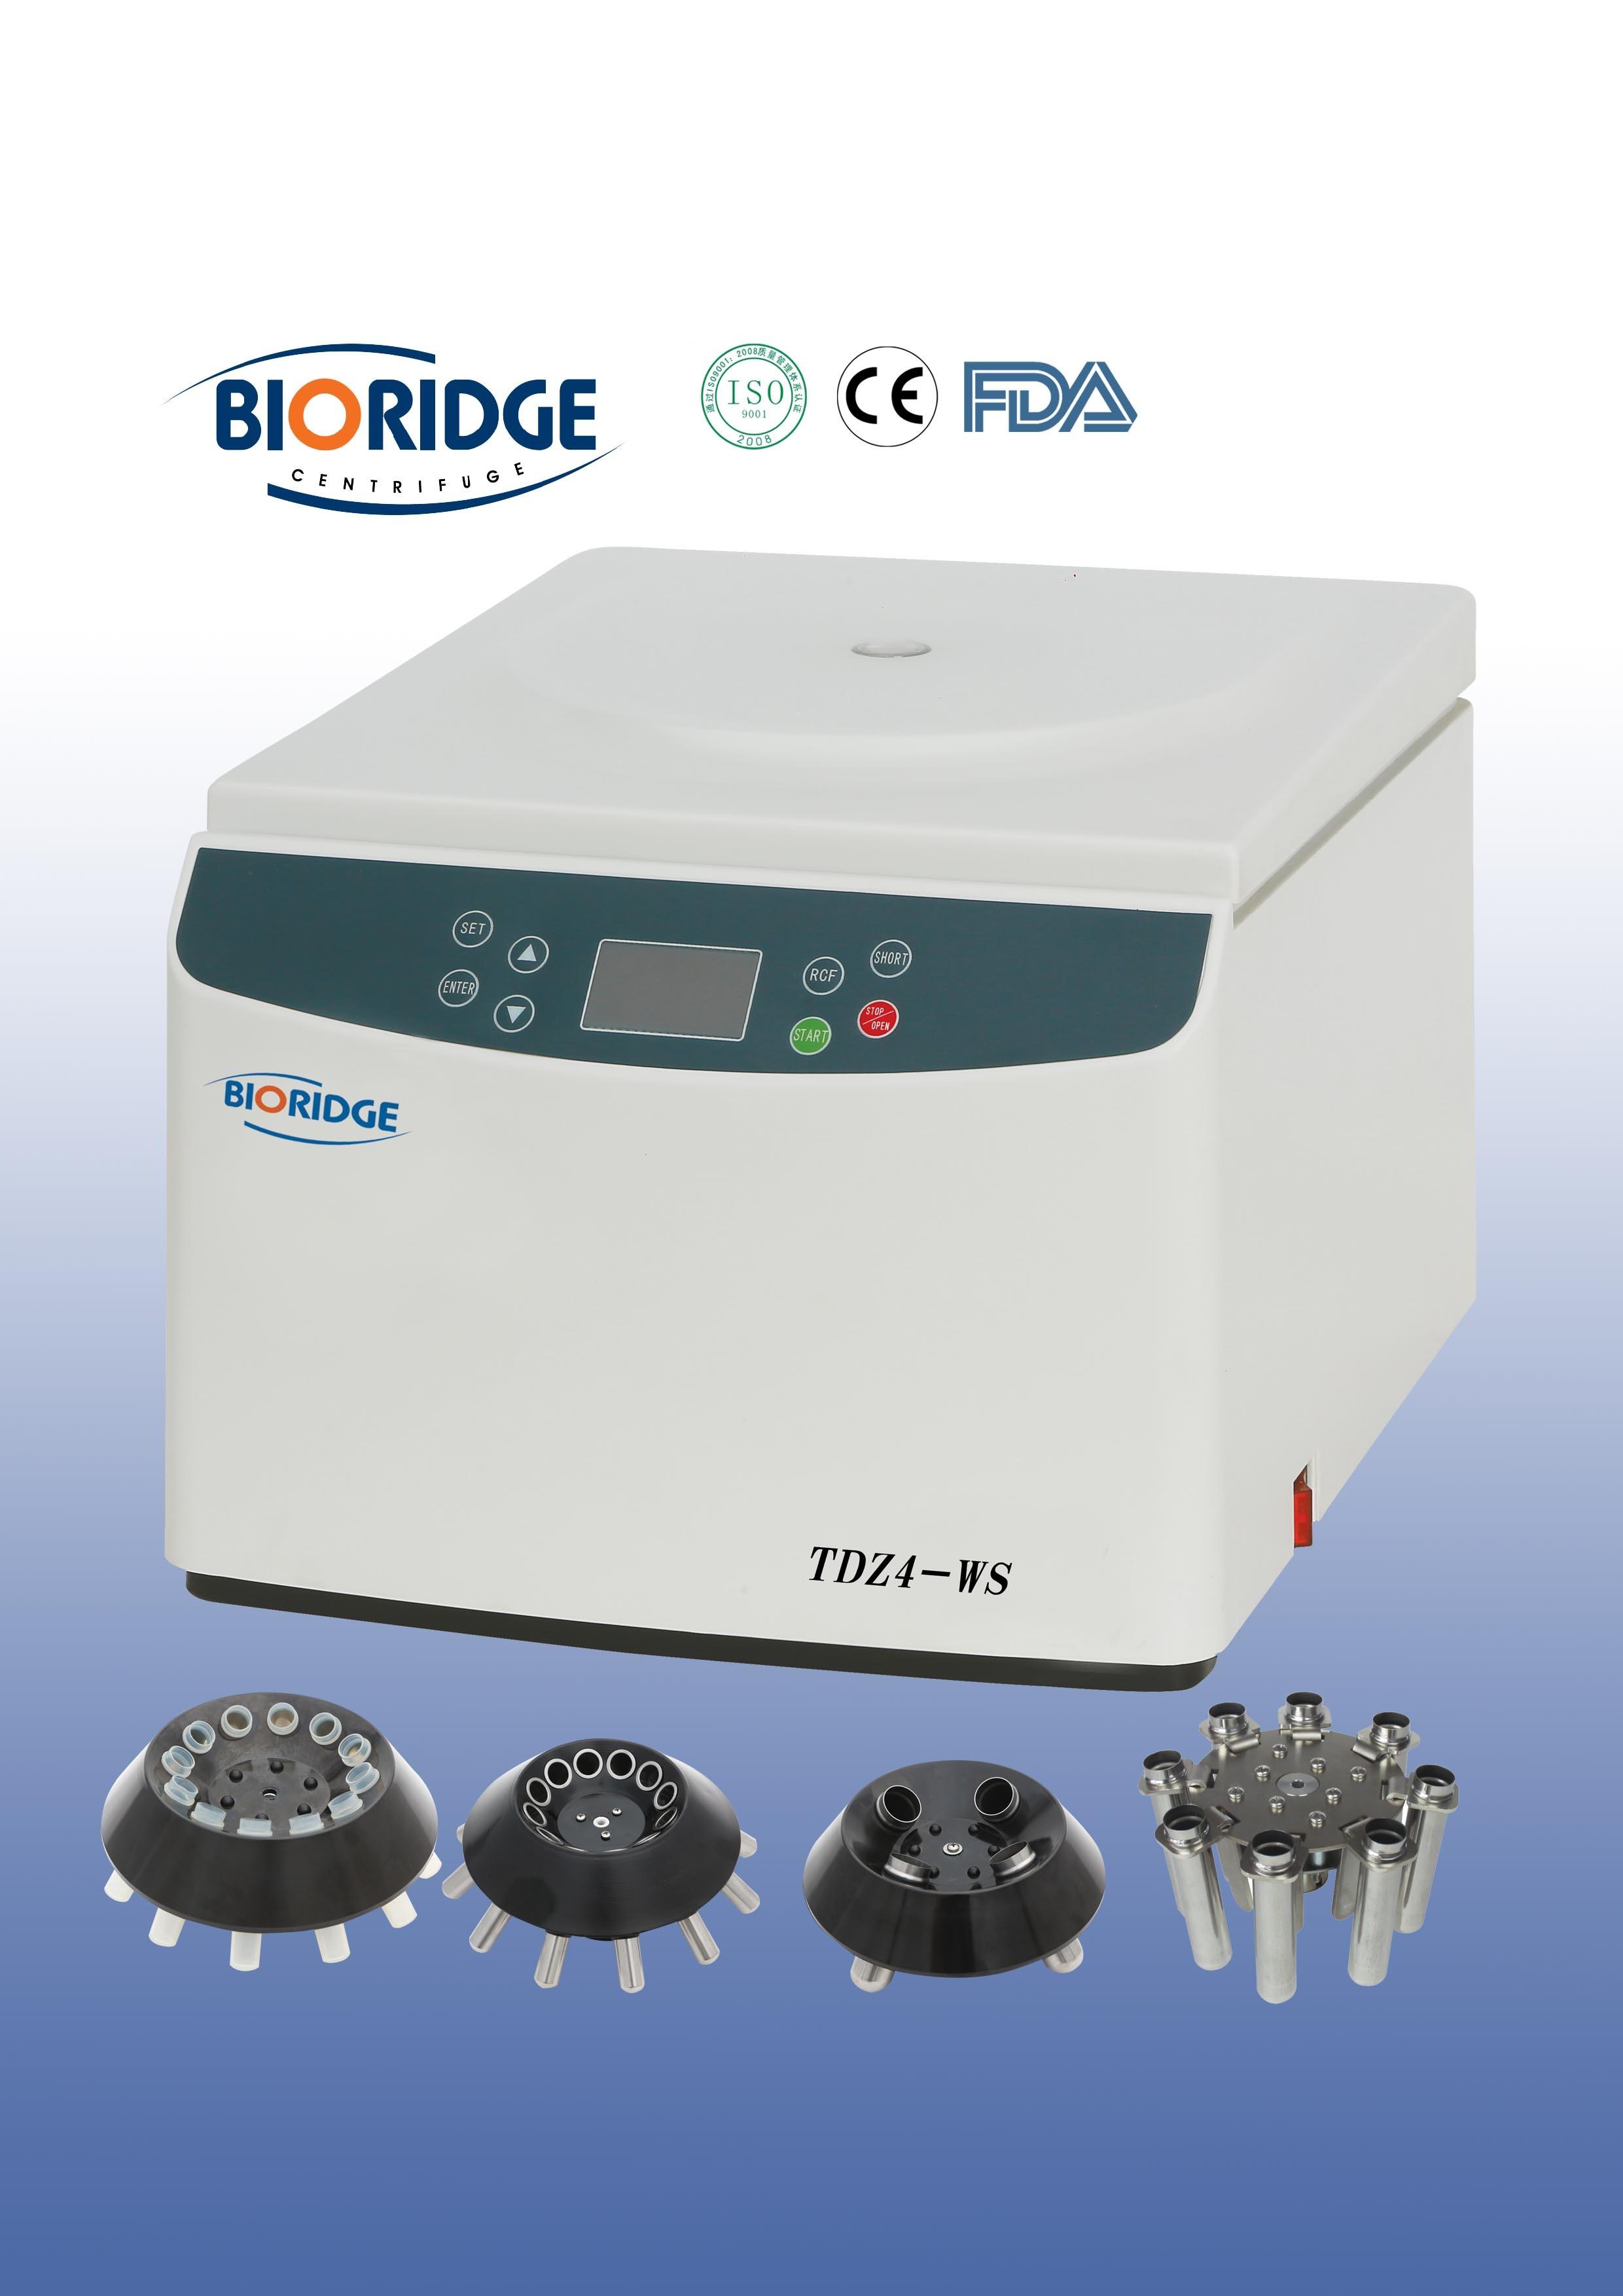 Laboratory Centrifuge (TDZ4-WS)